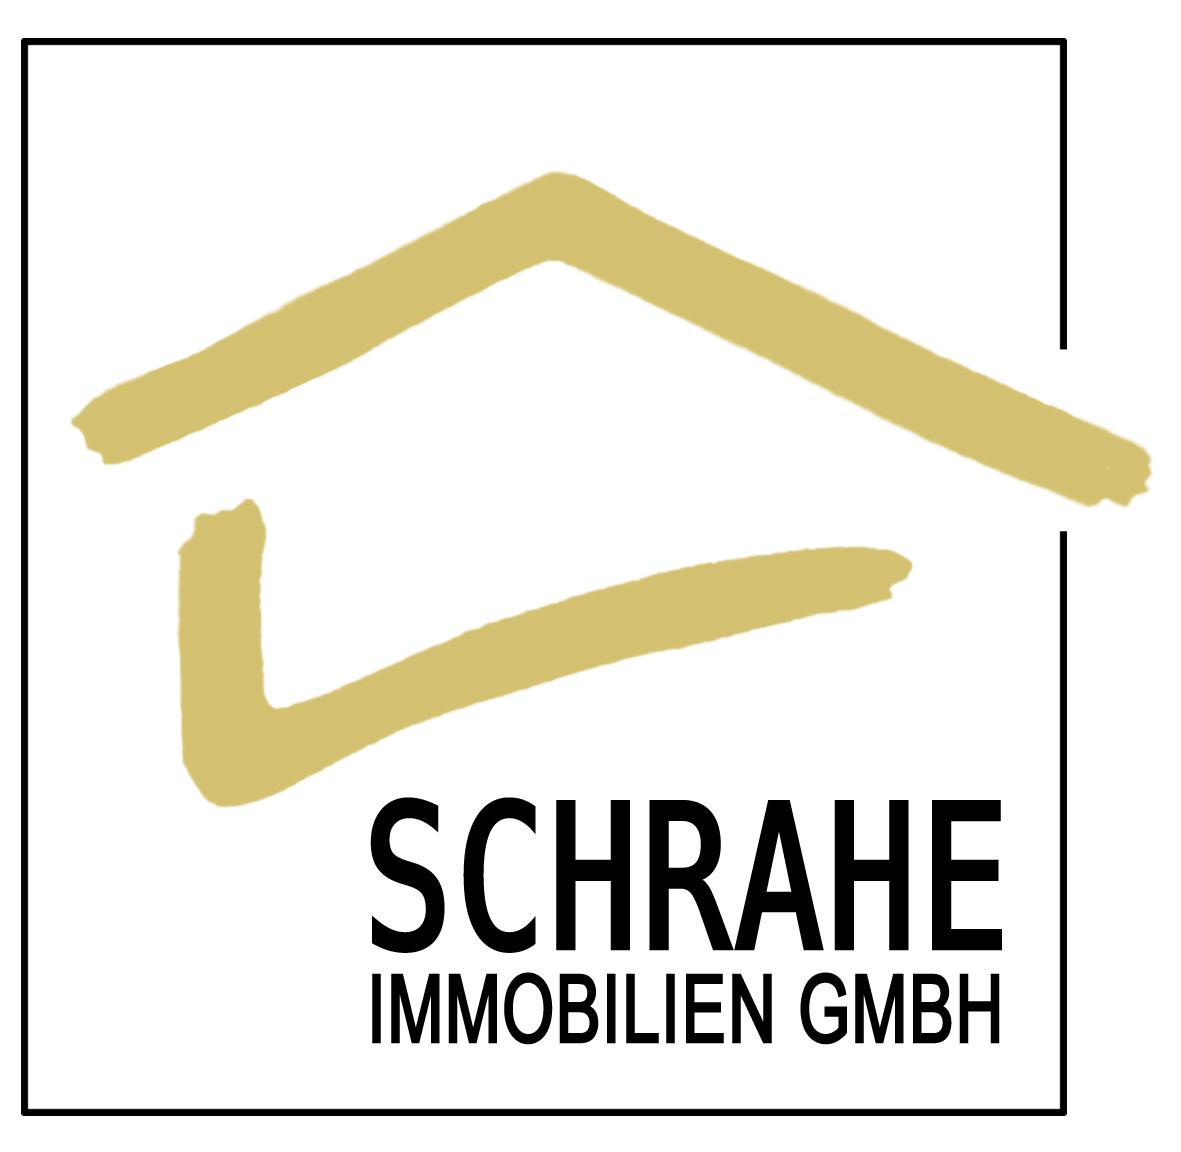 Logoschrahe300dpi